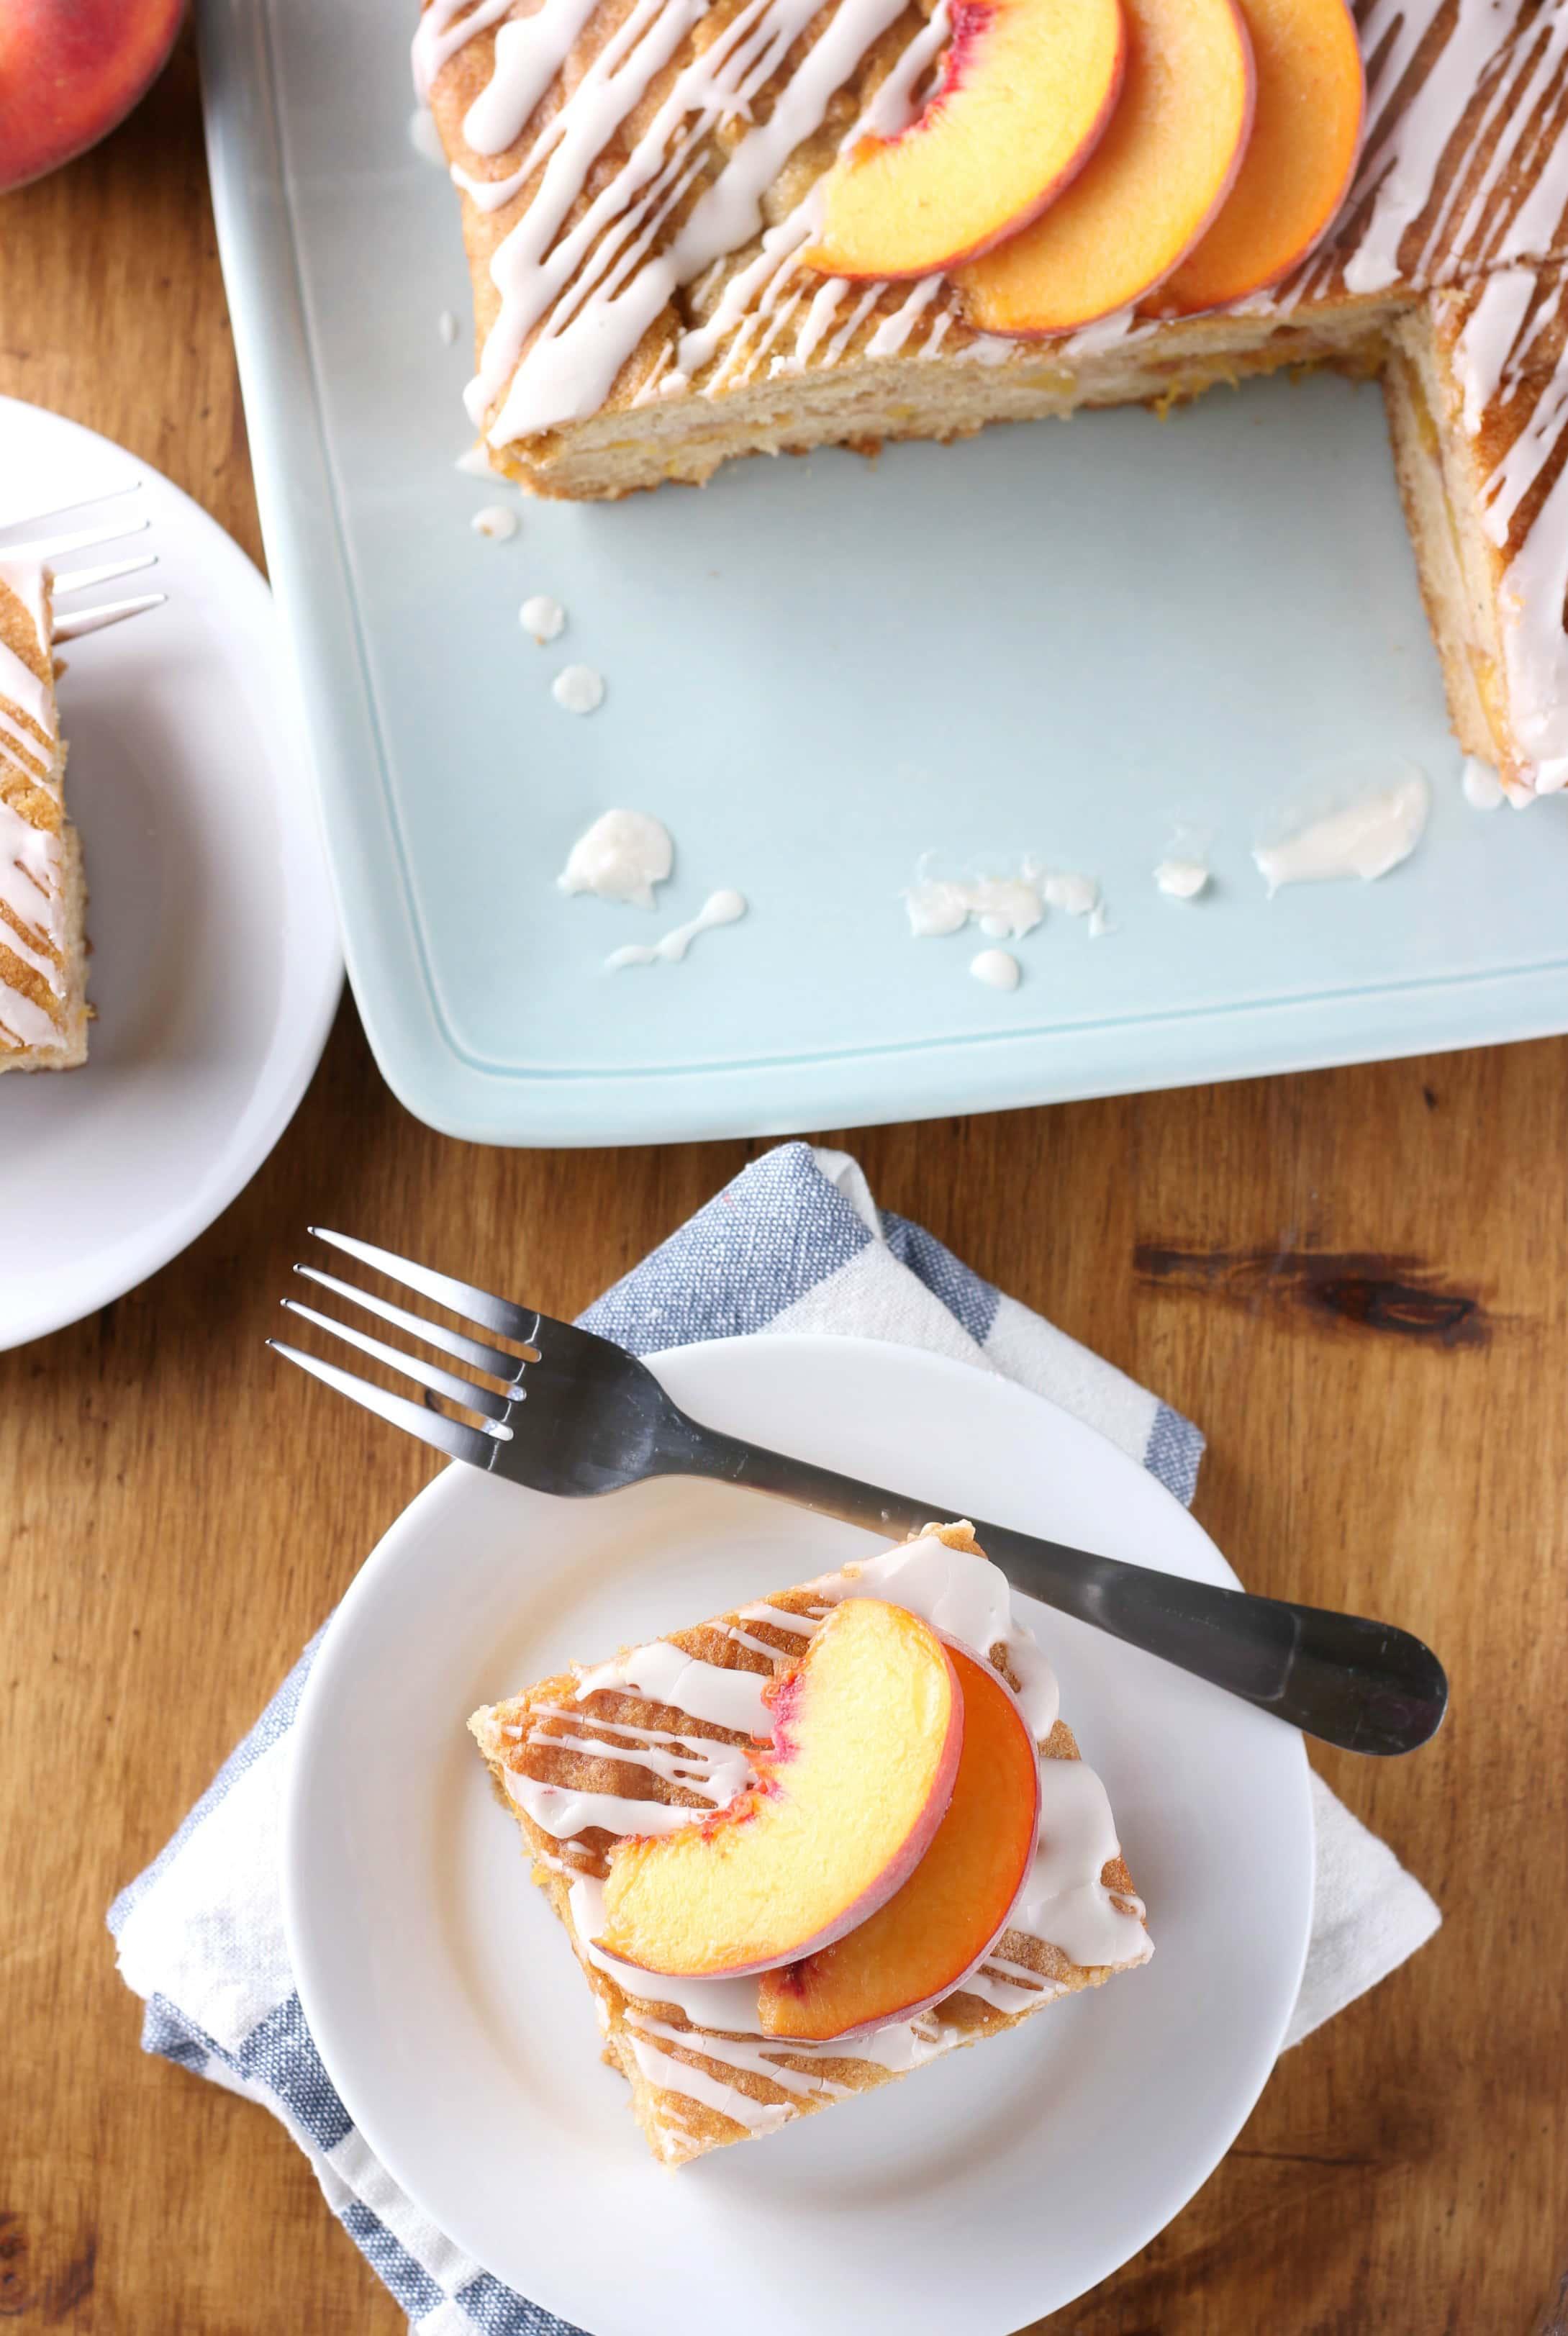 Peaches and Cream Cake Recipe from A Kitchen Addiction